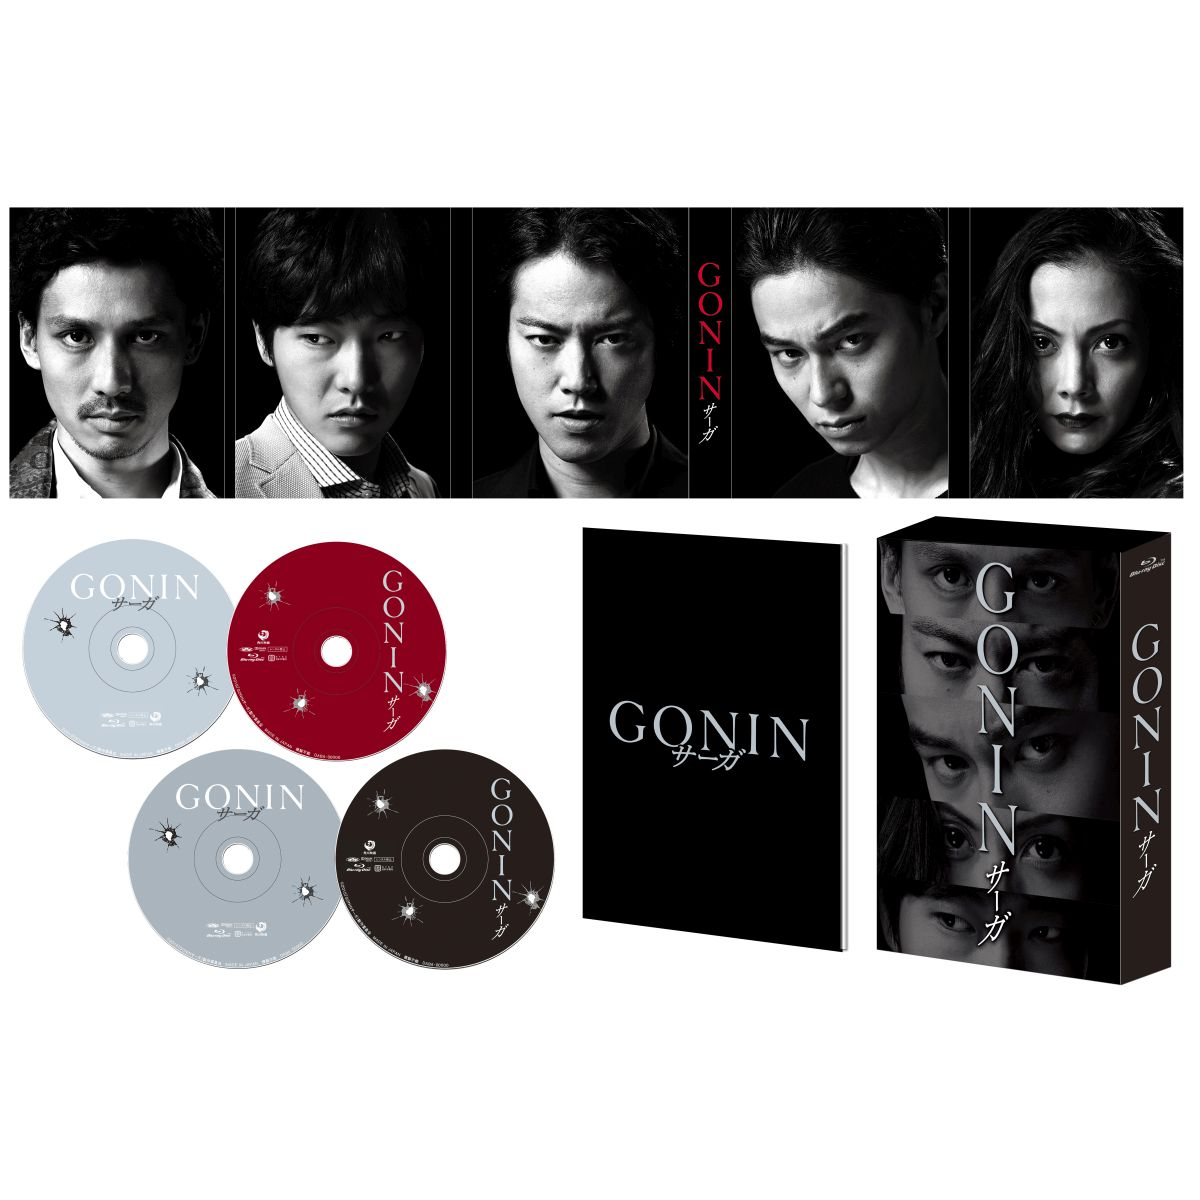 GONINサーガ ディレクターズ・ロングバージョン Blu-ray BOX[DAXA-4954][Blu-ray/ブルーレイ] 製品画像